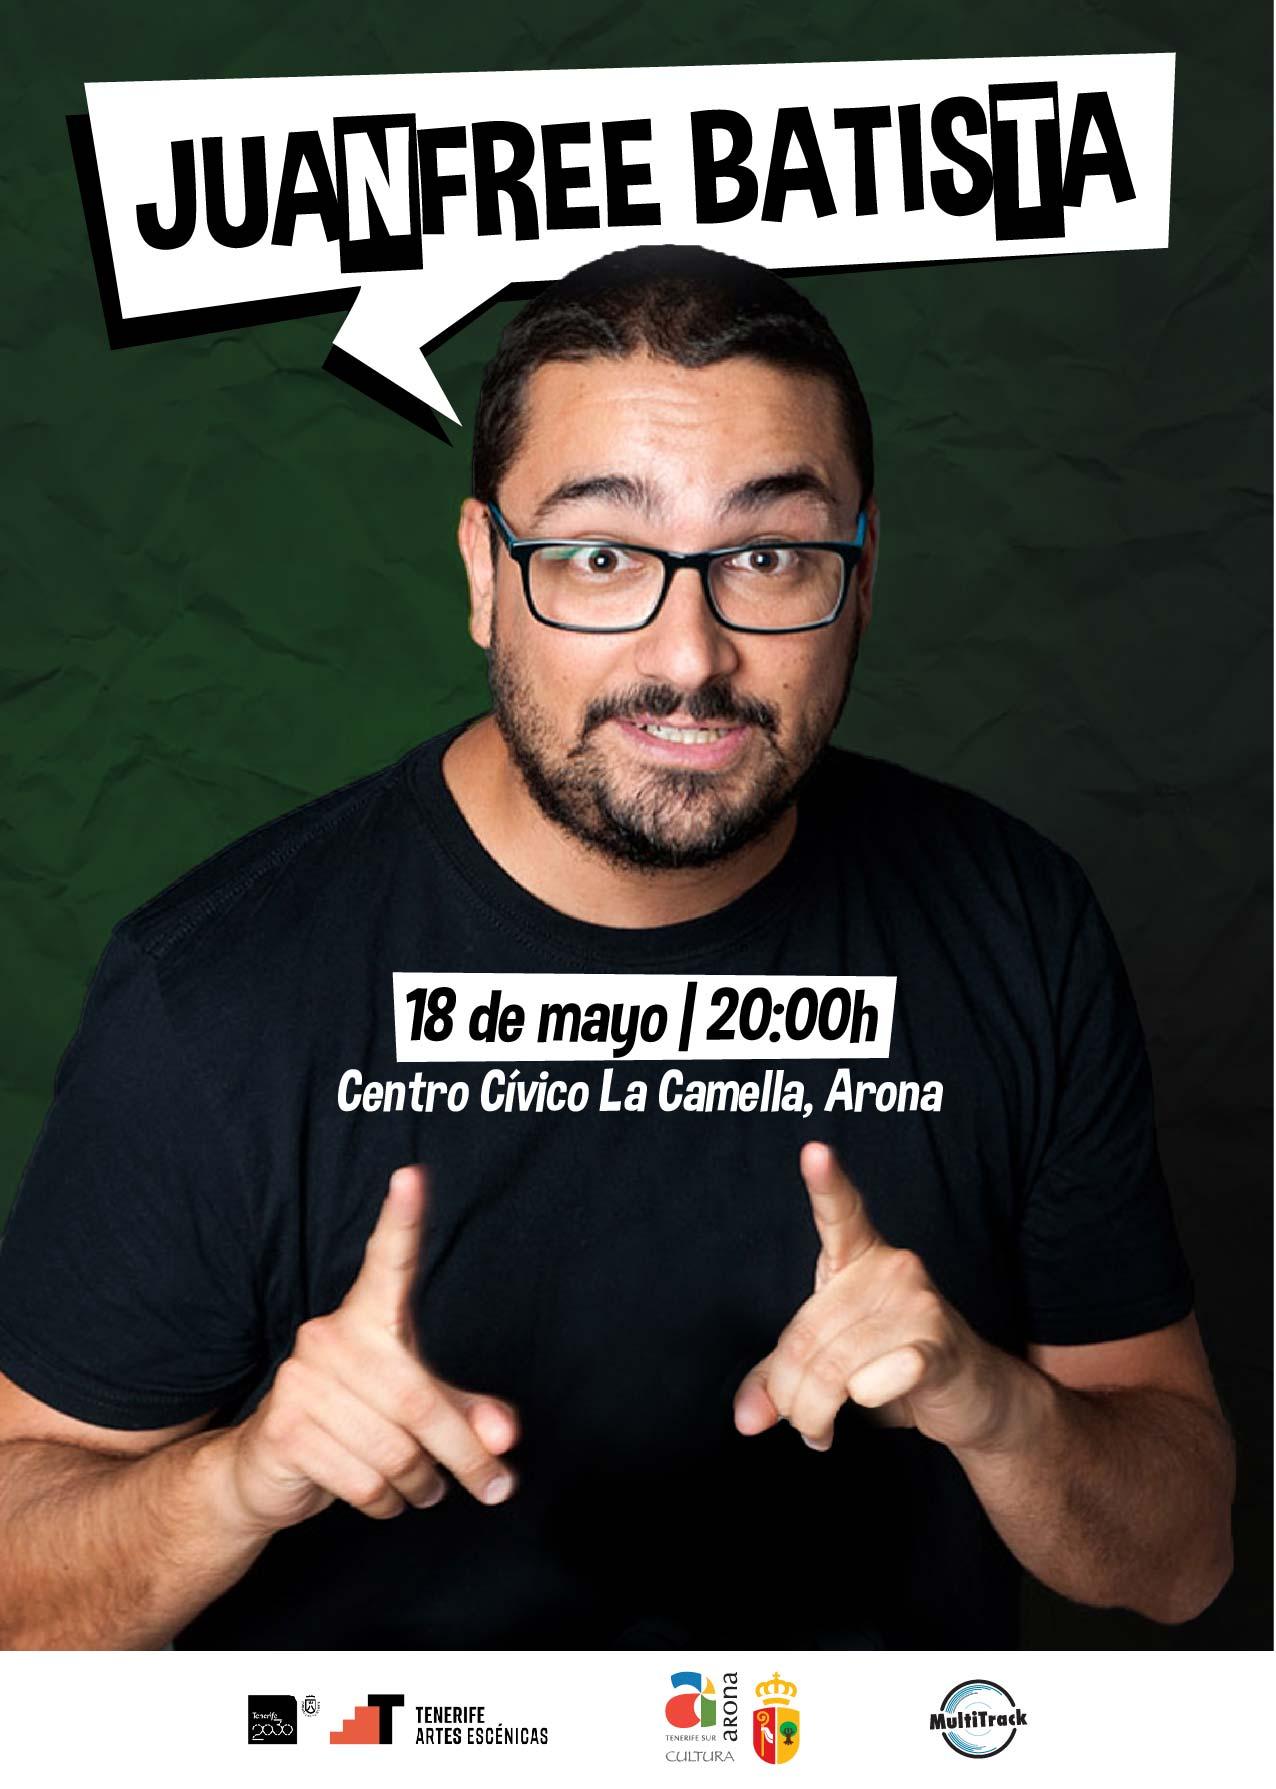 Juanfree Batista